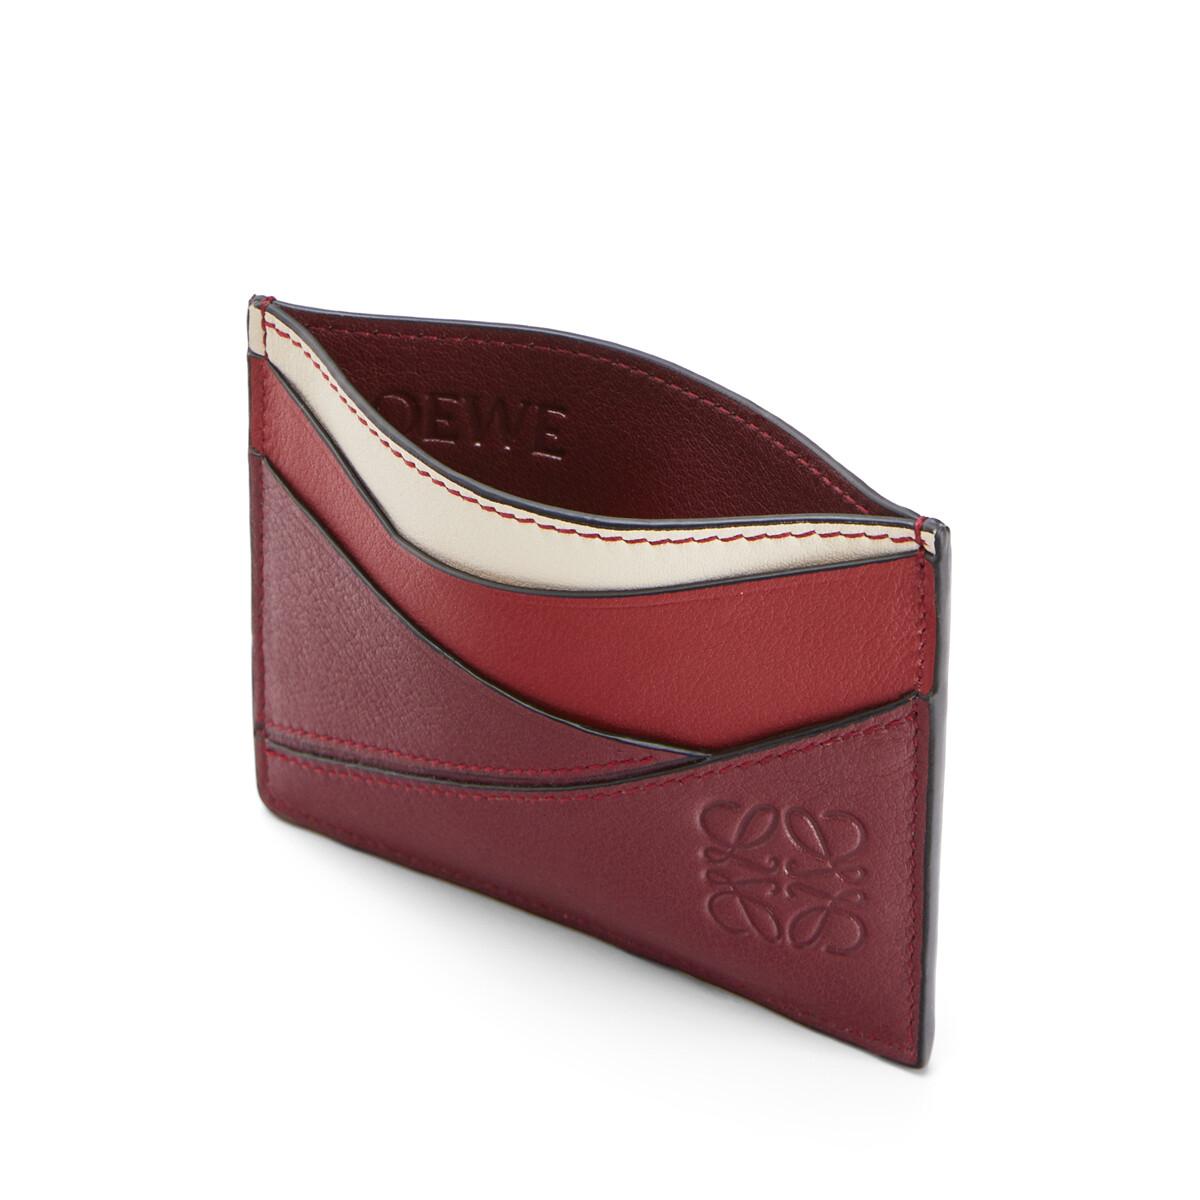 LOEWE Puzzle Plain Cardholder Wine/Garnet front